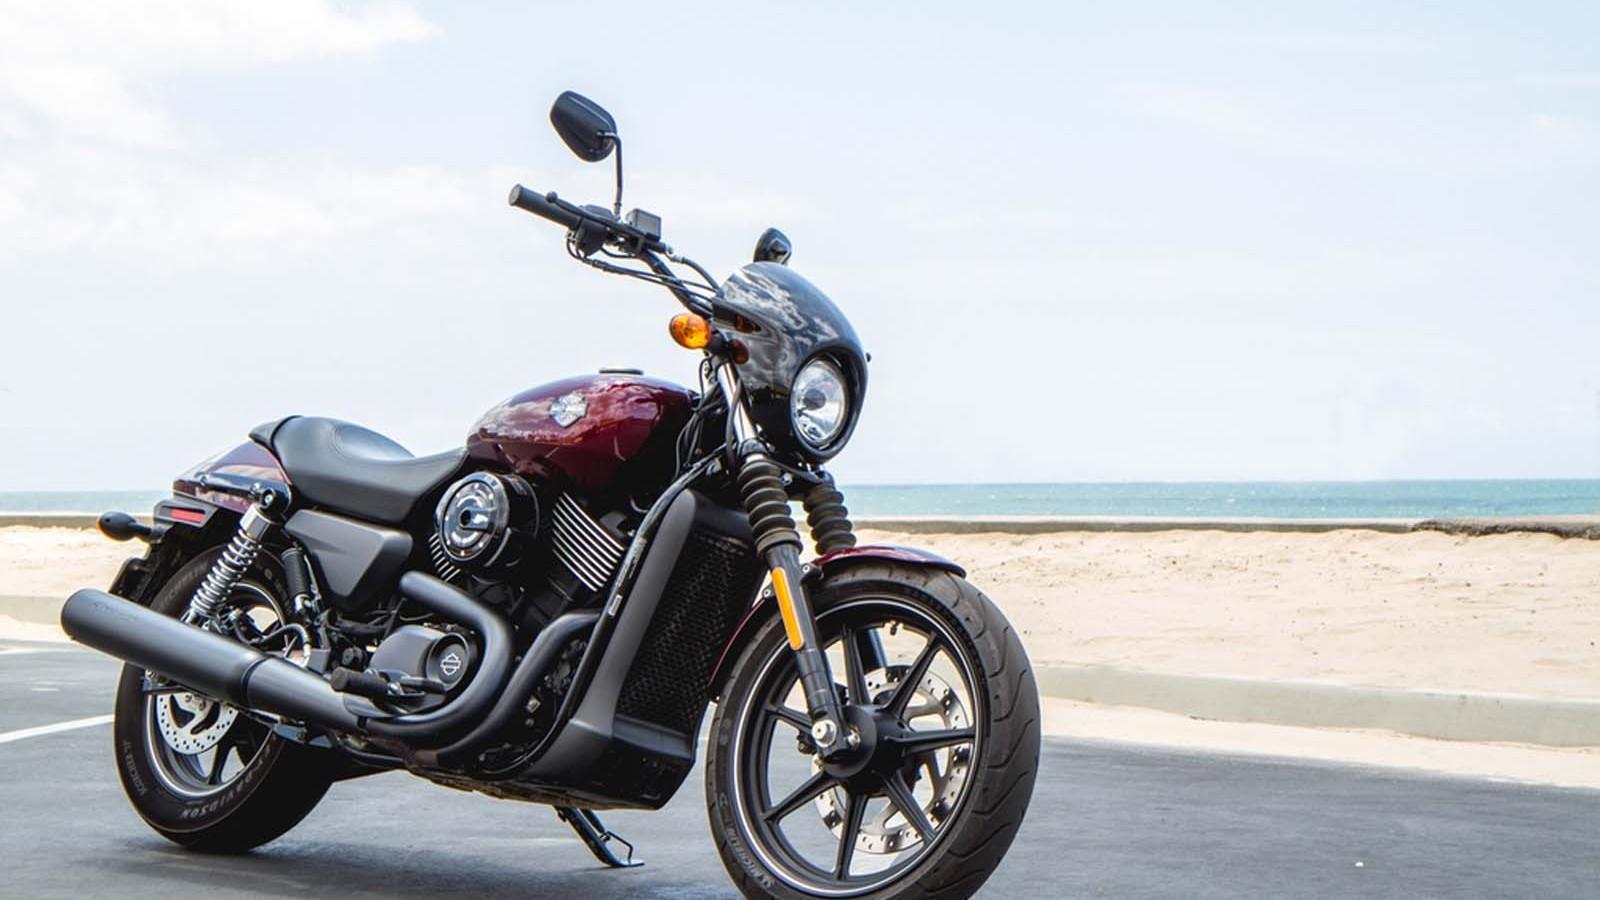 Harley-Davidson Street 750 by Alvin Dharmawan